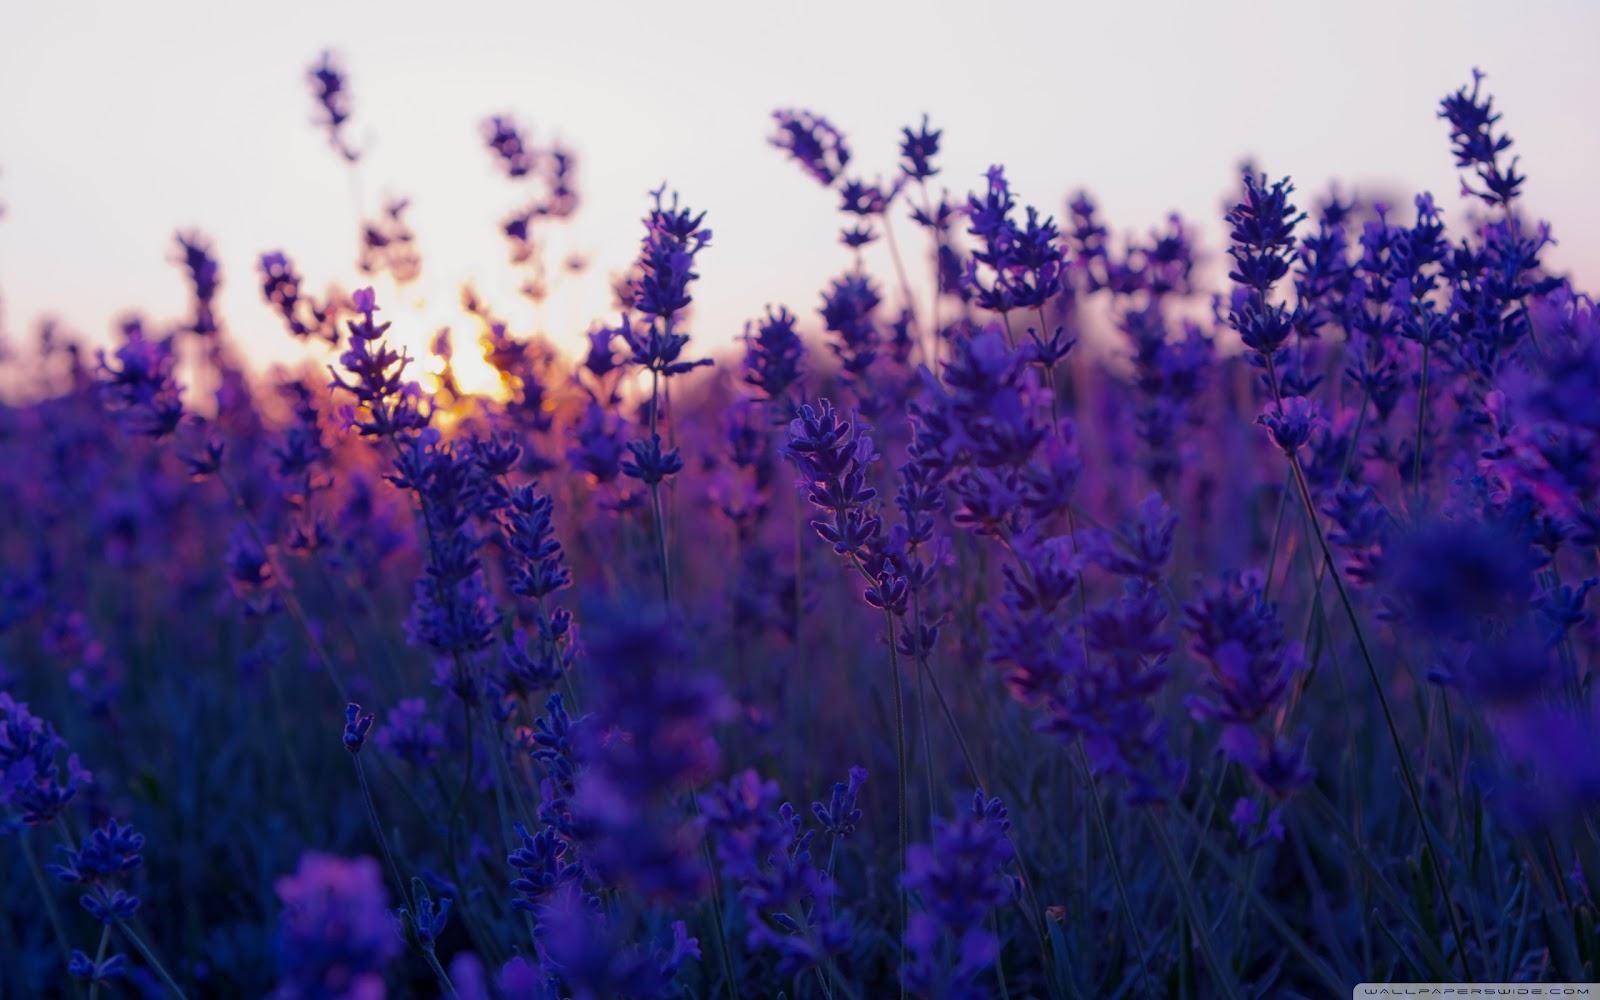 http://1.bp.blogspot.com/-OctB7K0kI5w/T6wtC0DwLPI/AAAAAAAAAWg/CUOYCdZK-ic/s1600/lavender_field_and_sunset-wallpaper-2560x1600.jpg